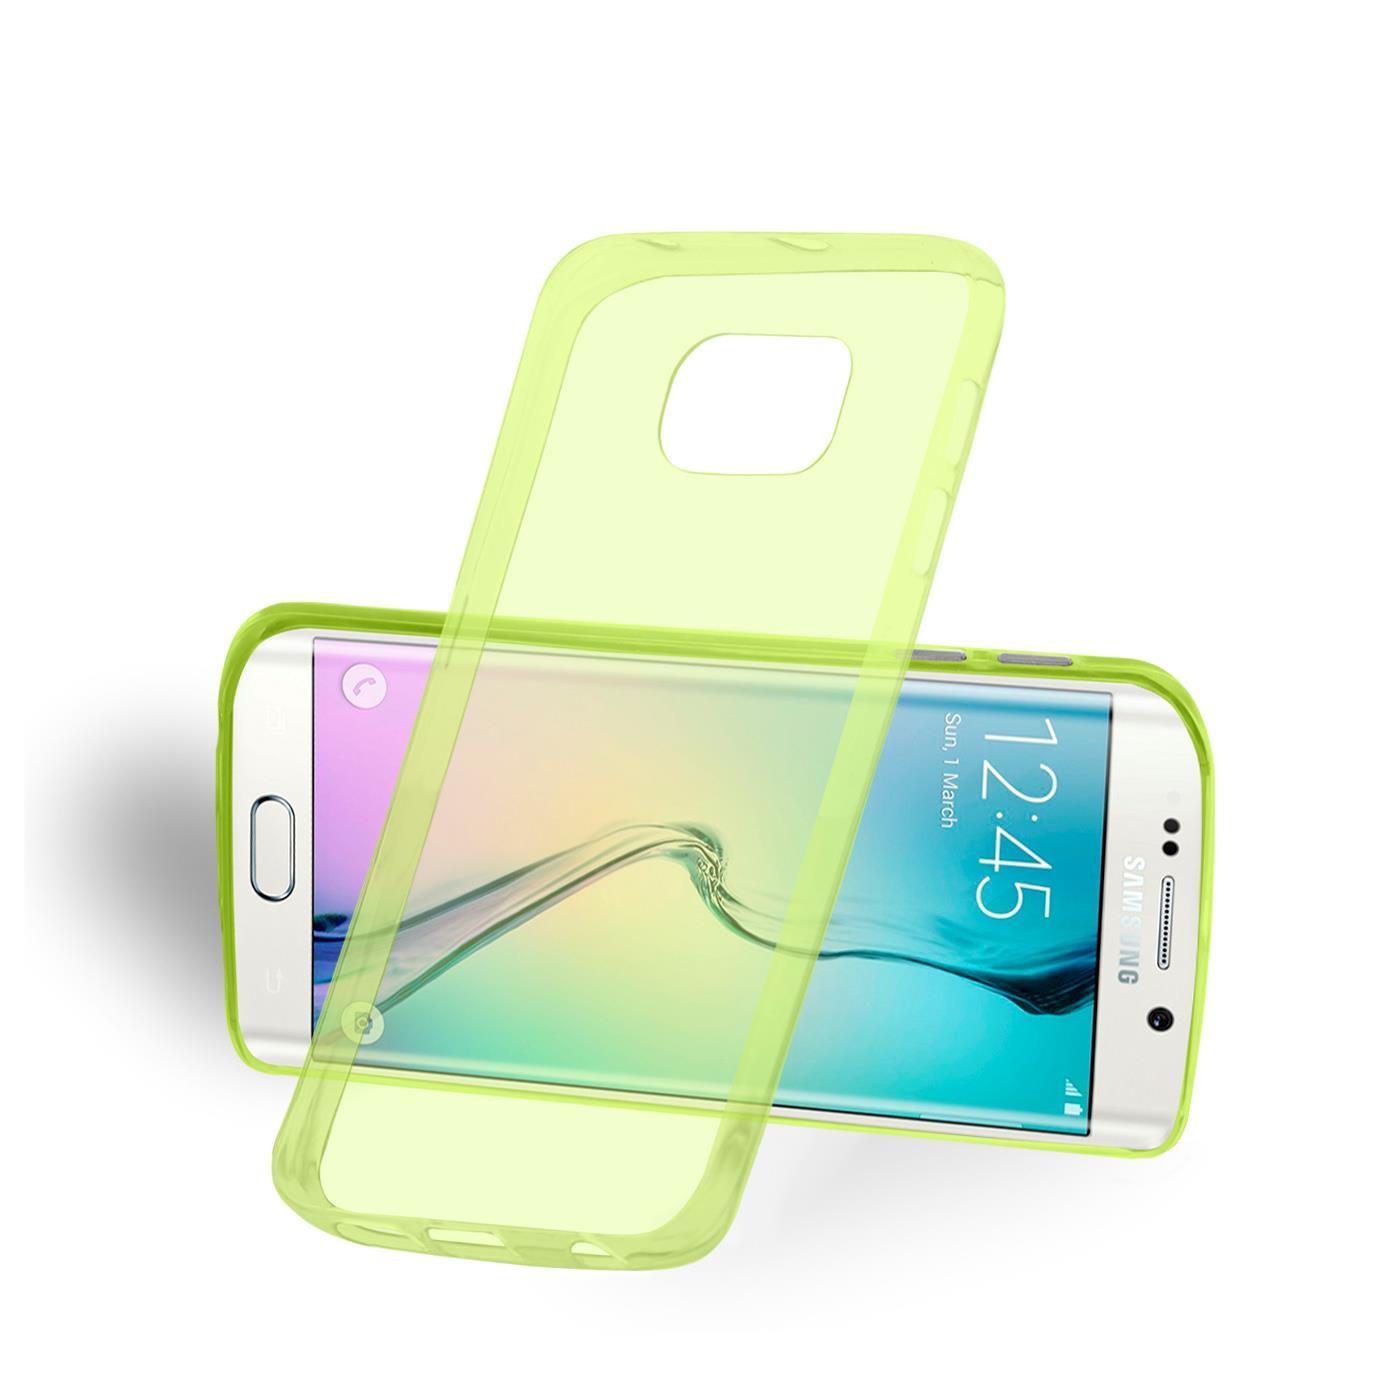 Samsung-Galaxy-s6-Edge-Plus-Thin-Silikon-Klar-Case-Cover-Ultra-Slim-Stossfeste Indexbild 13